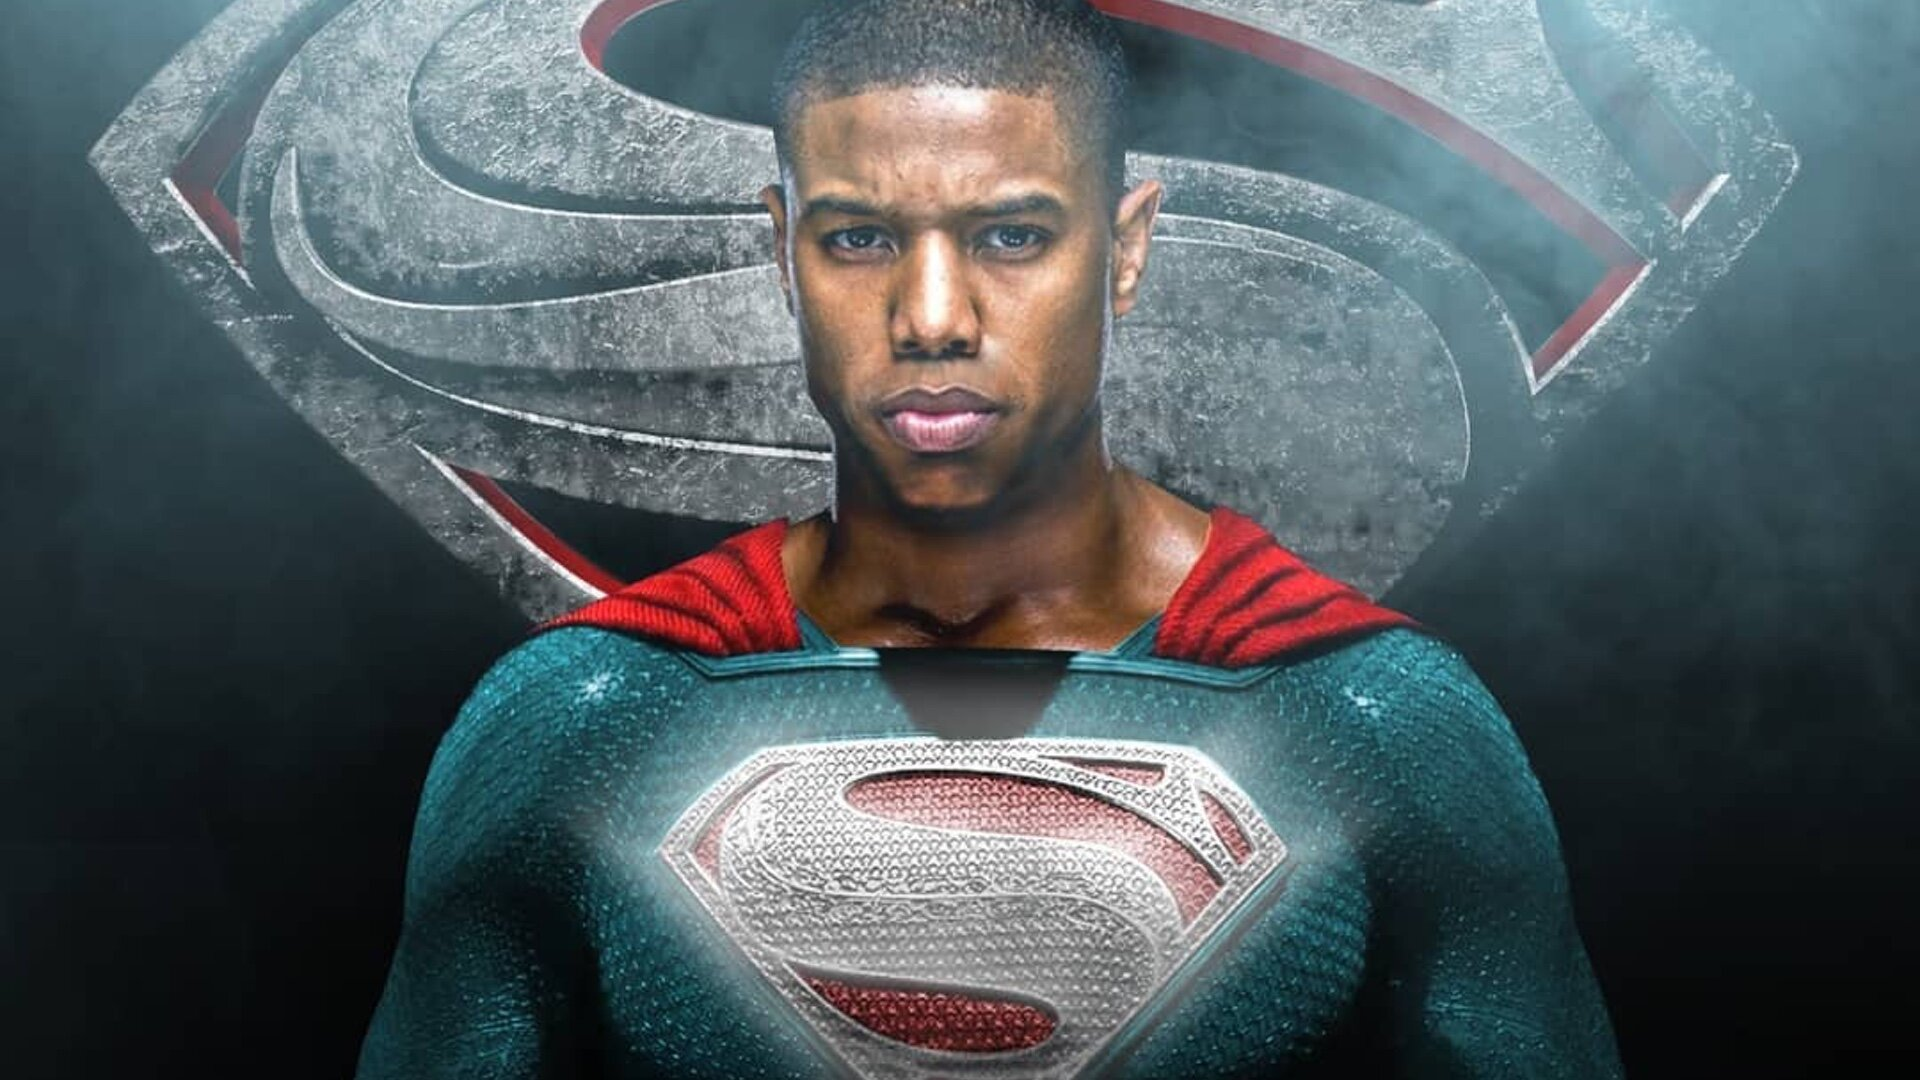 Hasil gambar untuk michael b jordan superman